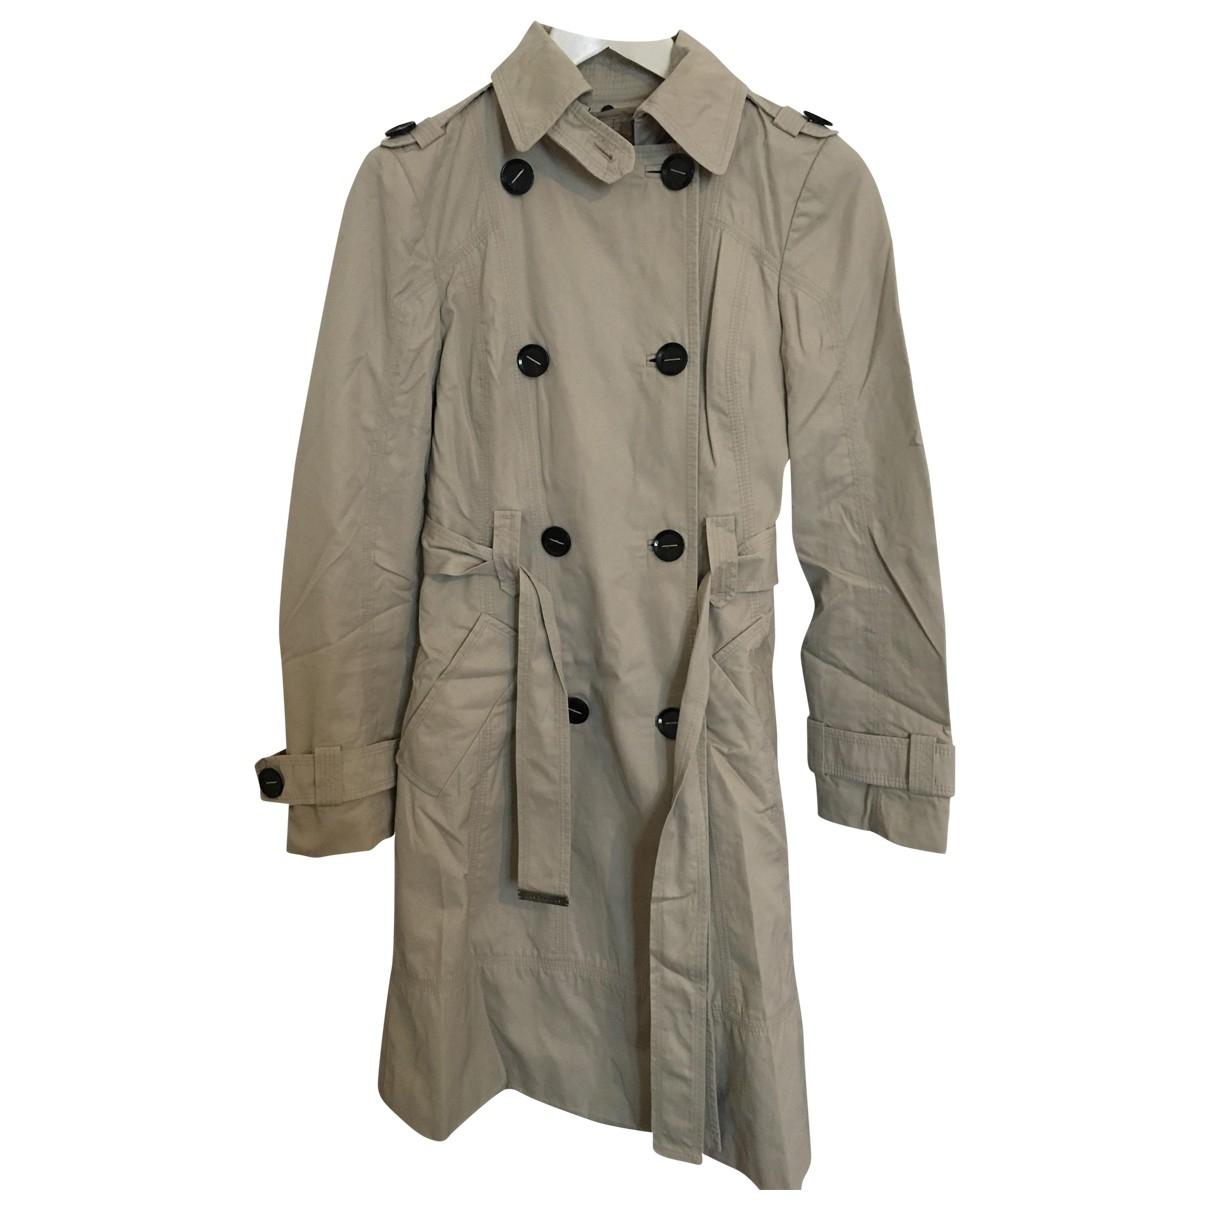 Zara \N Beige Cotton Trench coat for Women 34 FR